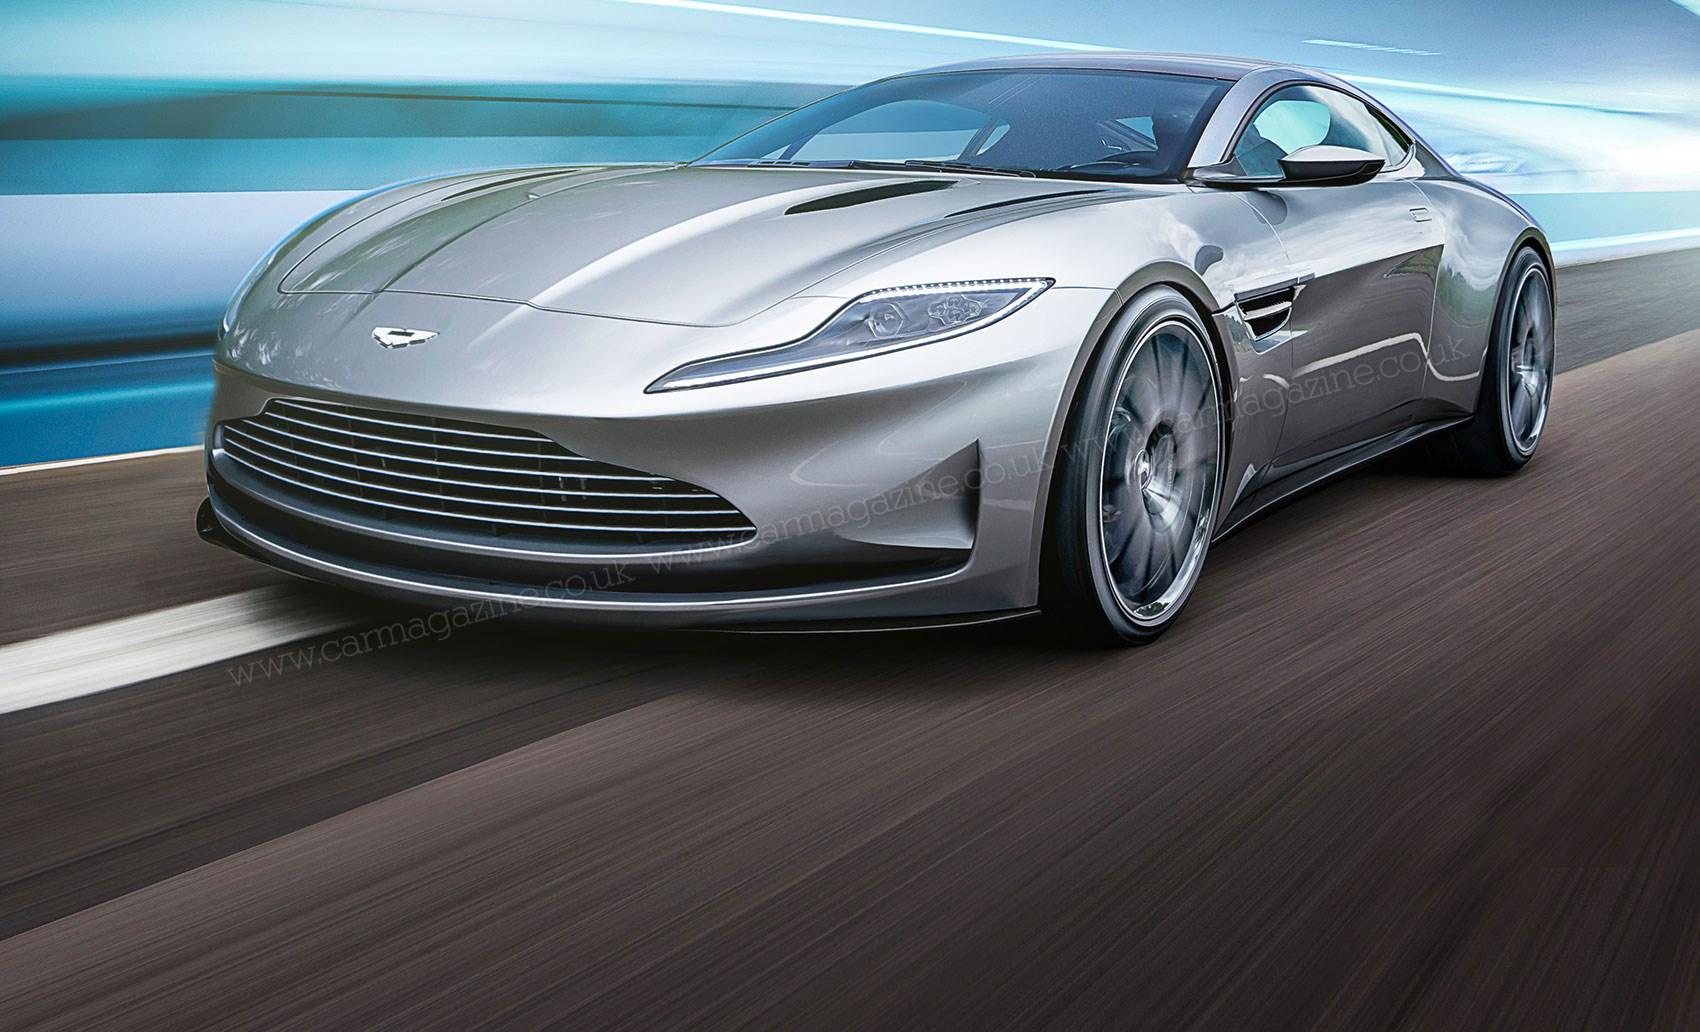 Aston Martin DB AMR Hotter Plusher Greener CAR Magazine - Aston martin lease